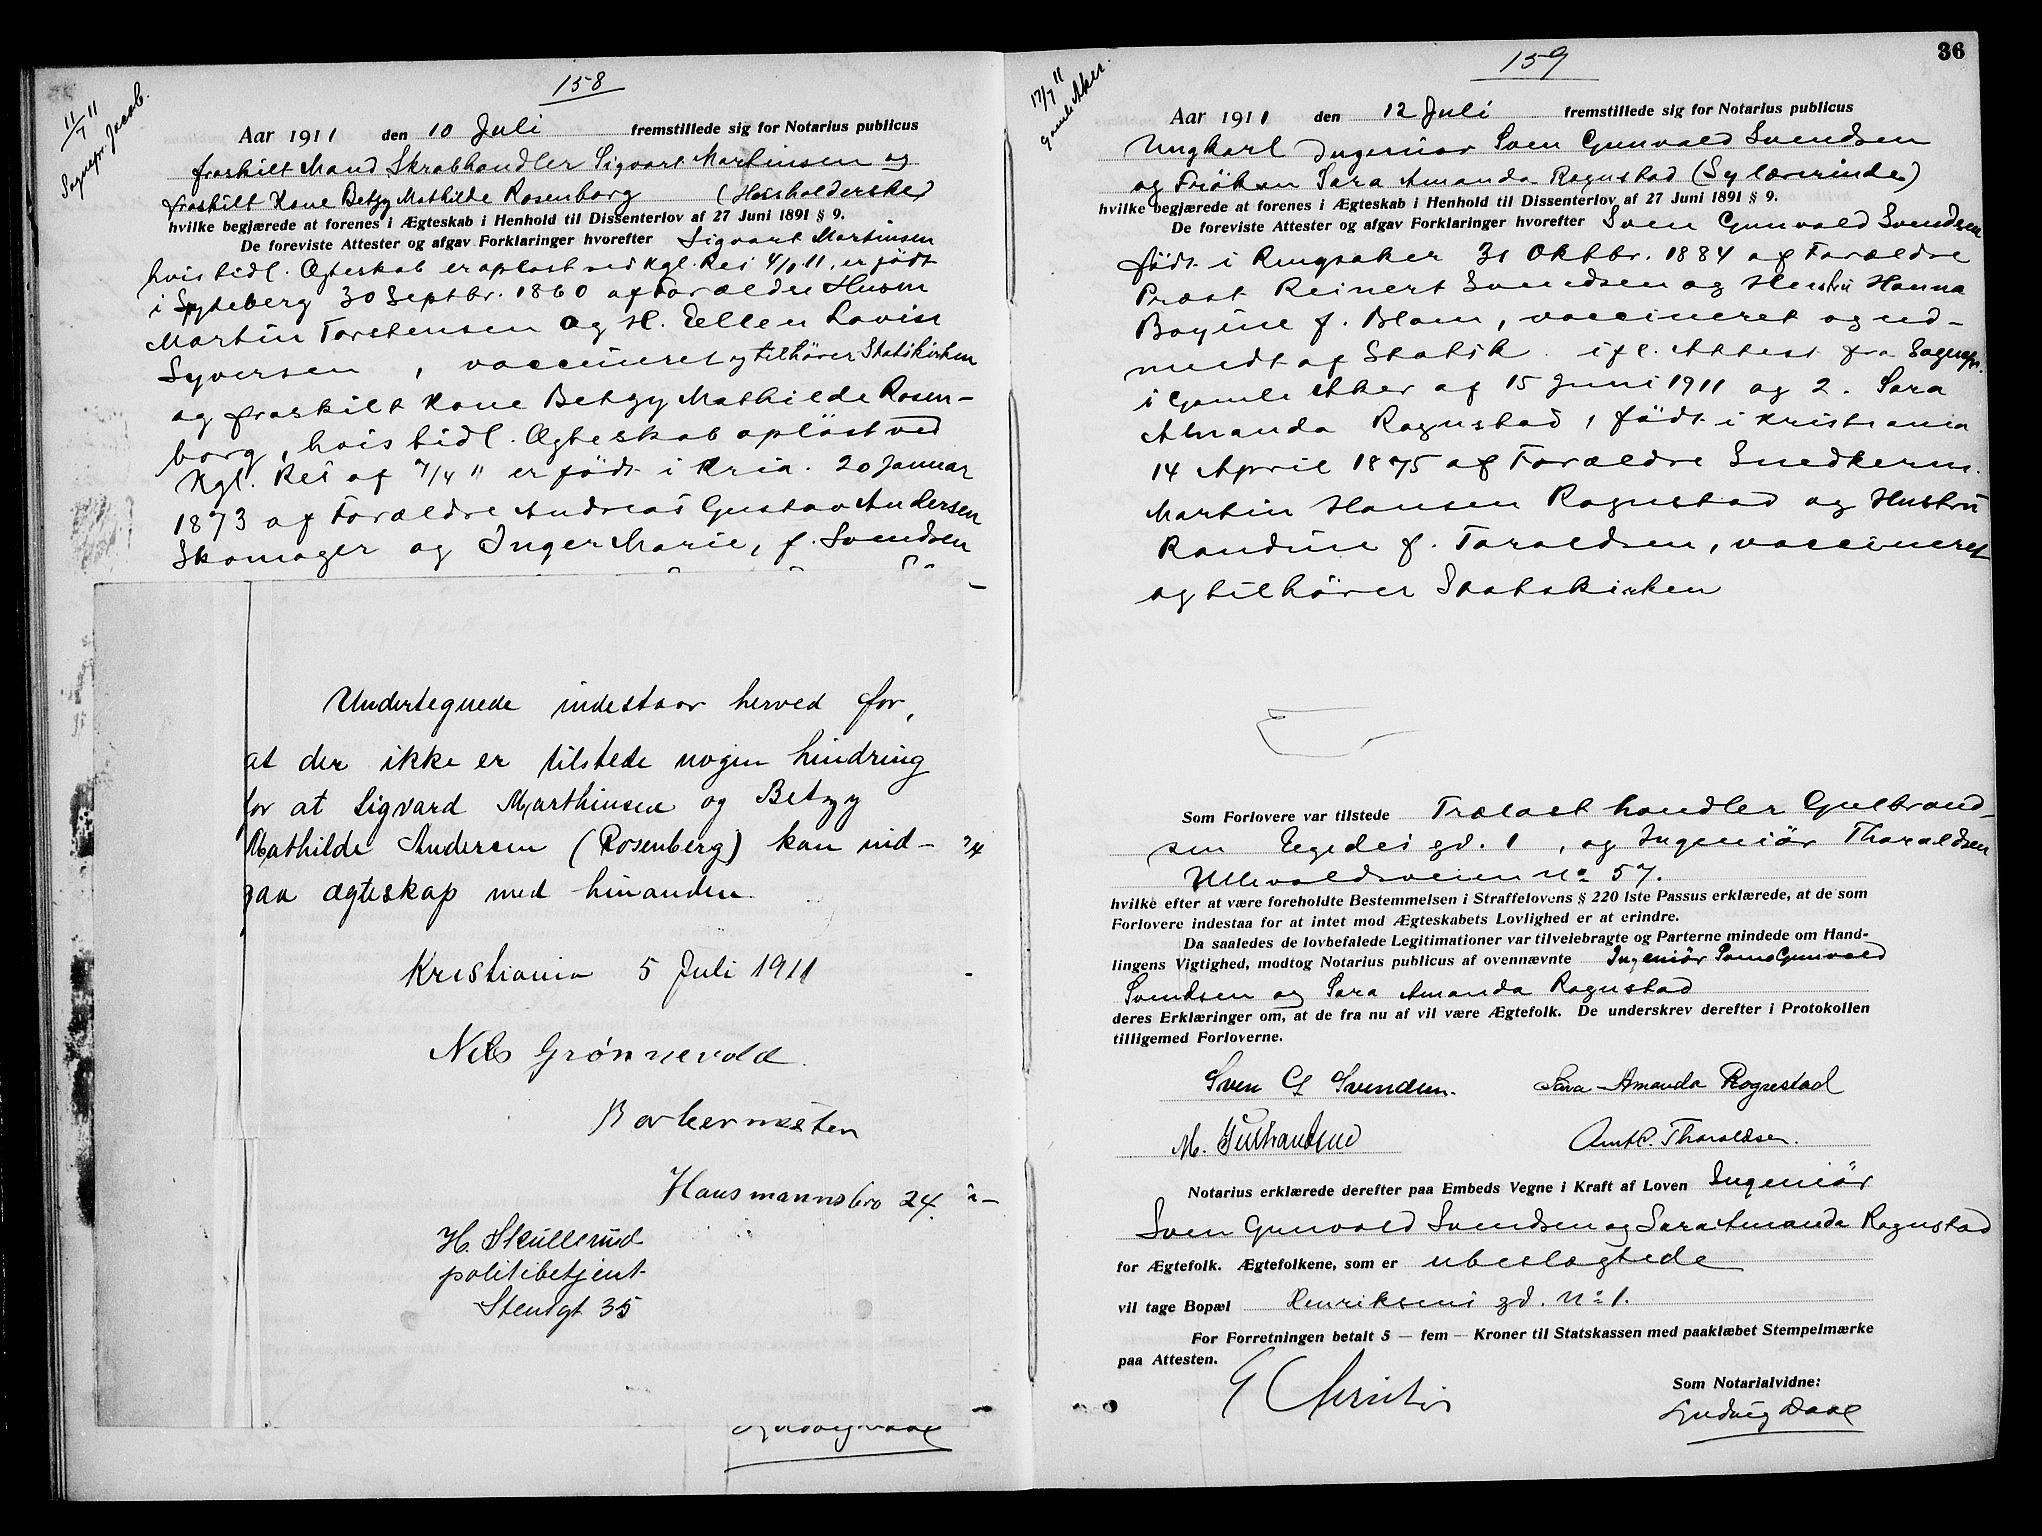 SAO, Oslo byfogd avd. I, L/Lb/Lbb/L0008: Notarialprotokoll, rekke II: Vigsler, 1911-1913, s. 35b-36a